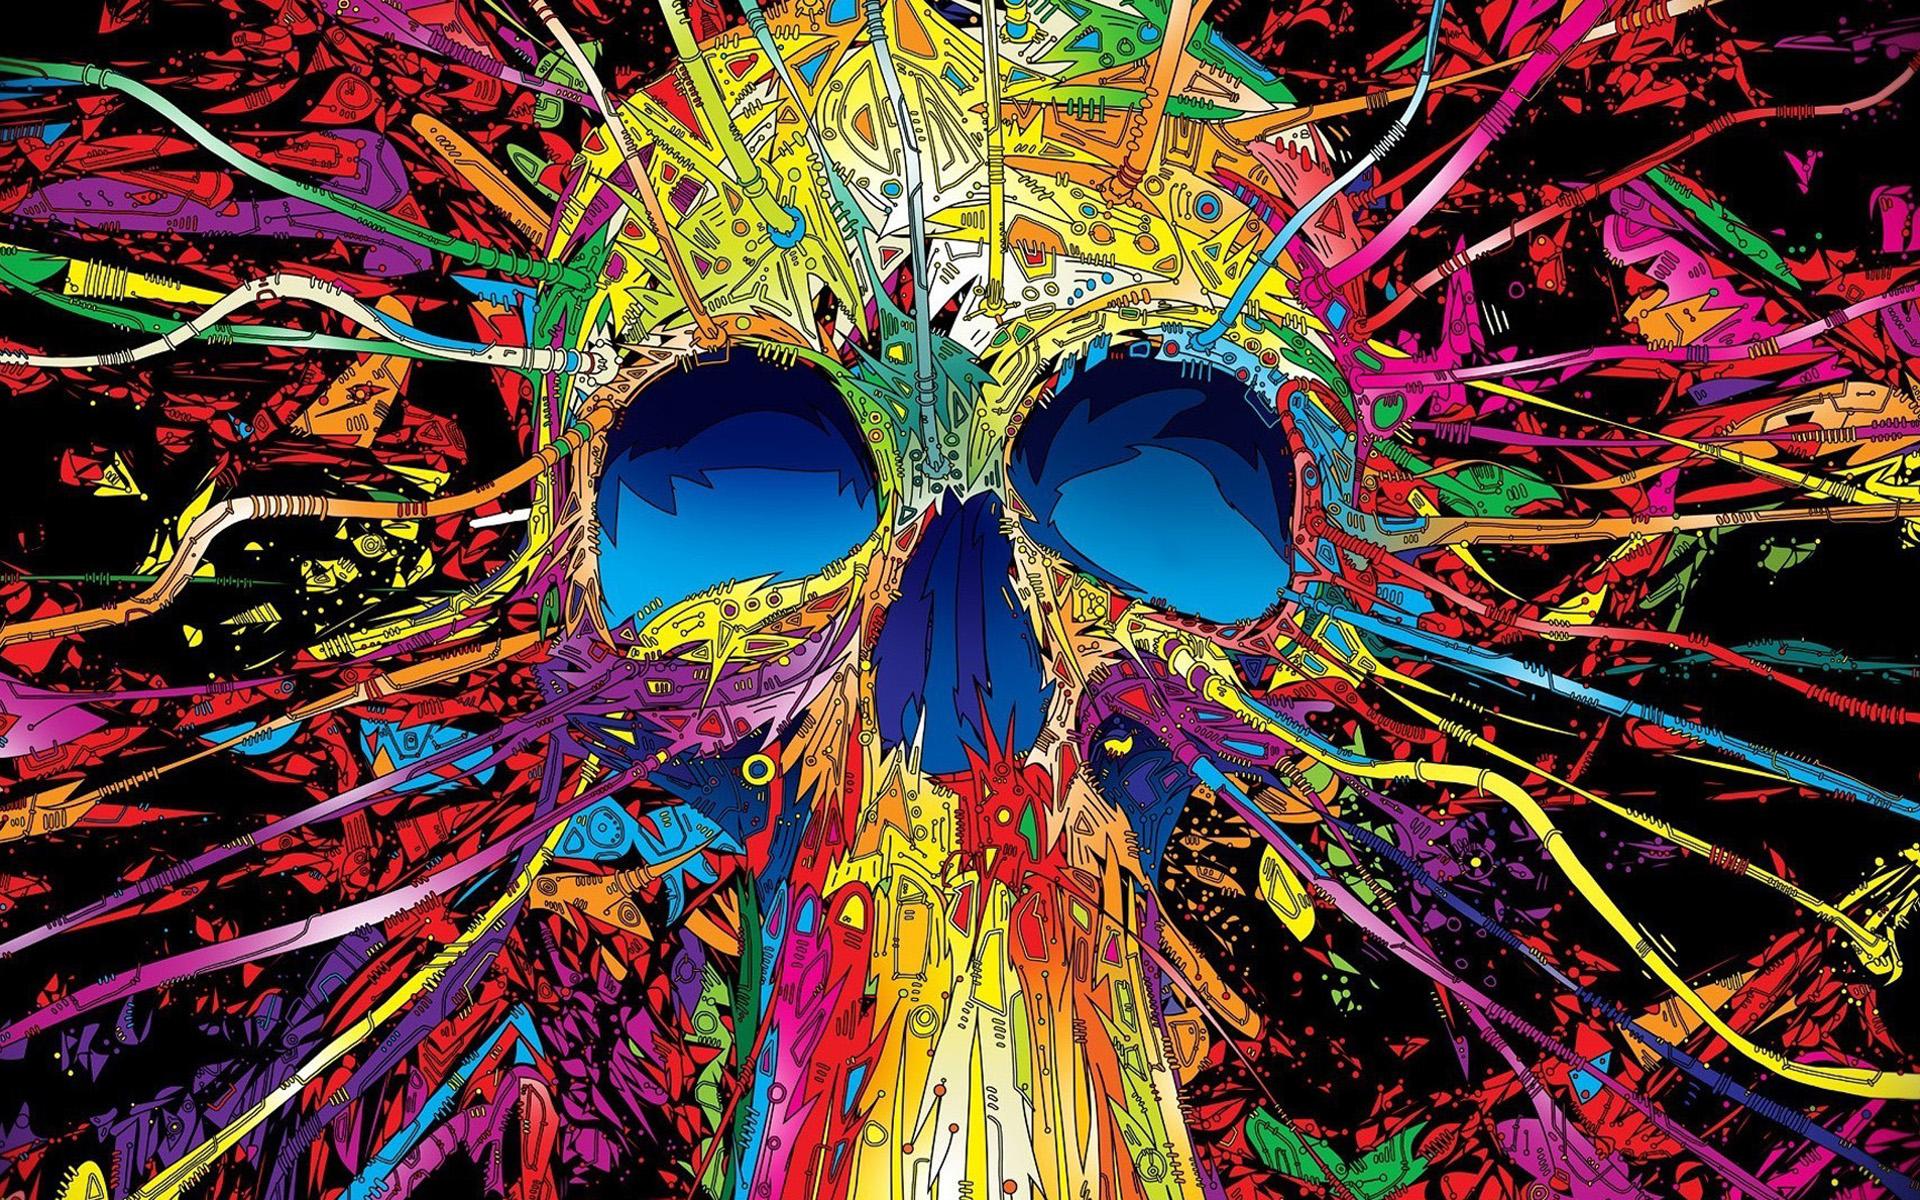 [46+] Sugar Skull Computer Wallpaper on WallpaperSafari